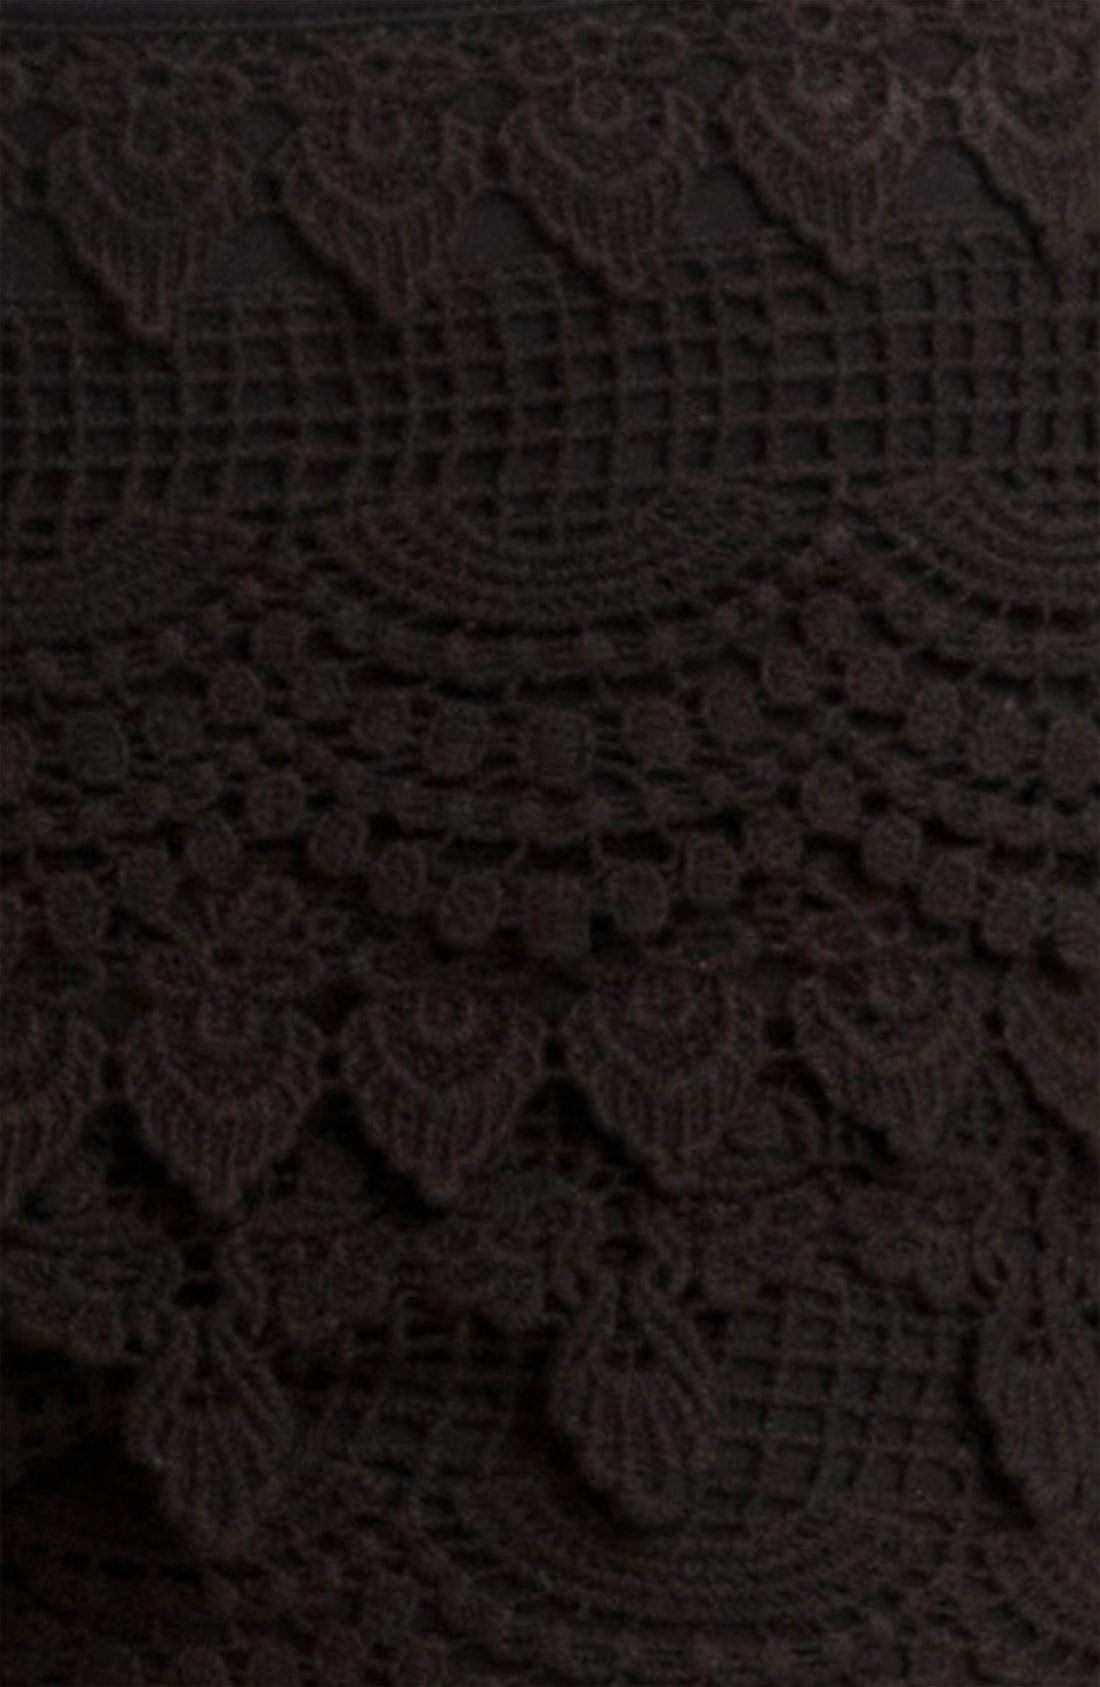 Lush Tiered Crochet Shorts,                             Alternate thumbnail 3, color,                             001